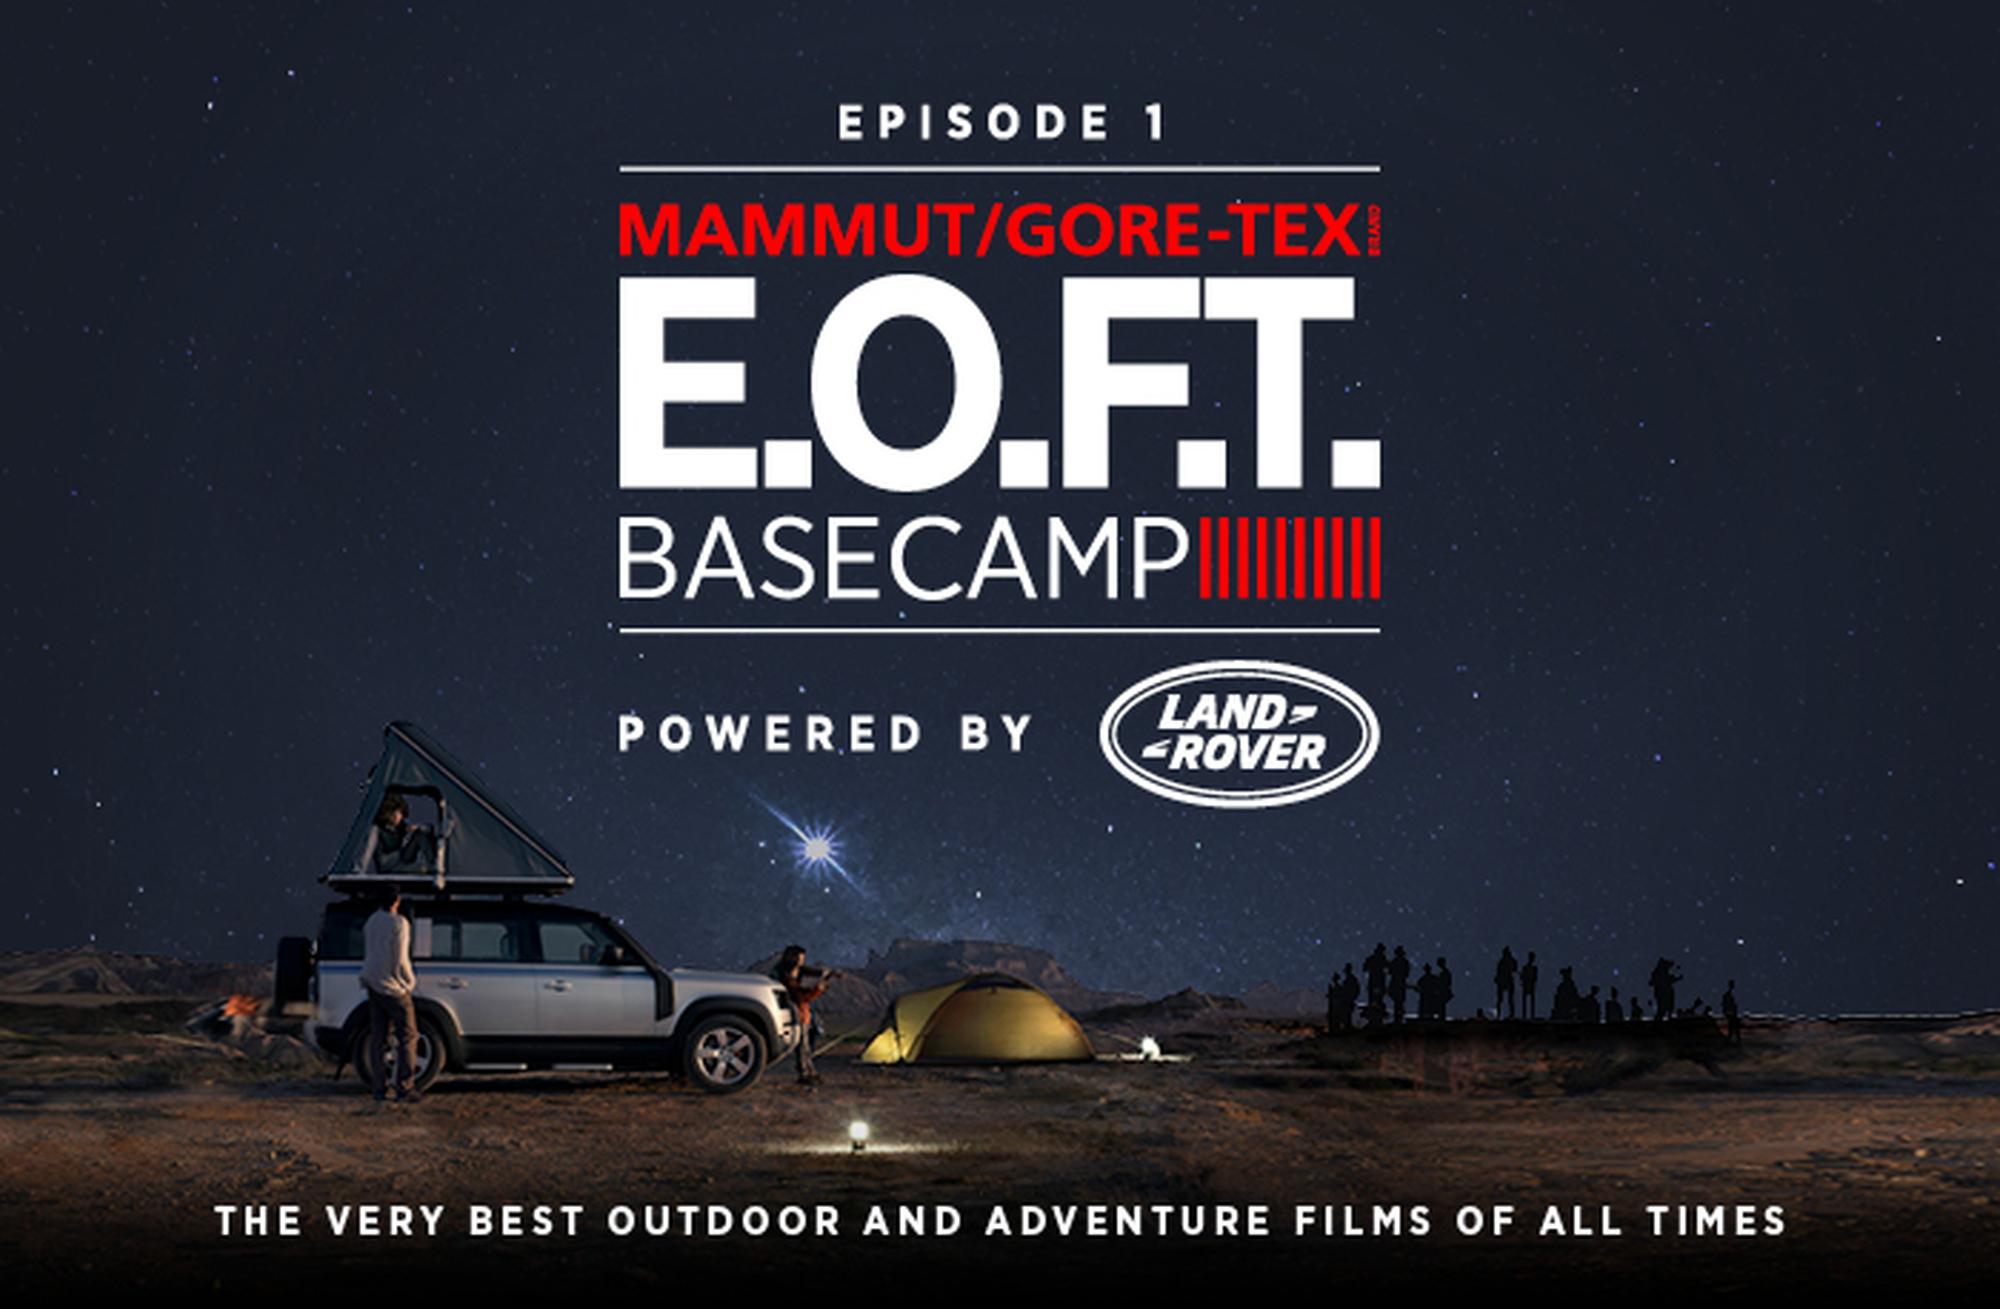 E.O.F.T. Basecamp Die besten Outdoor-Filme fürs Sofa